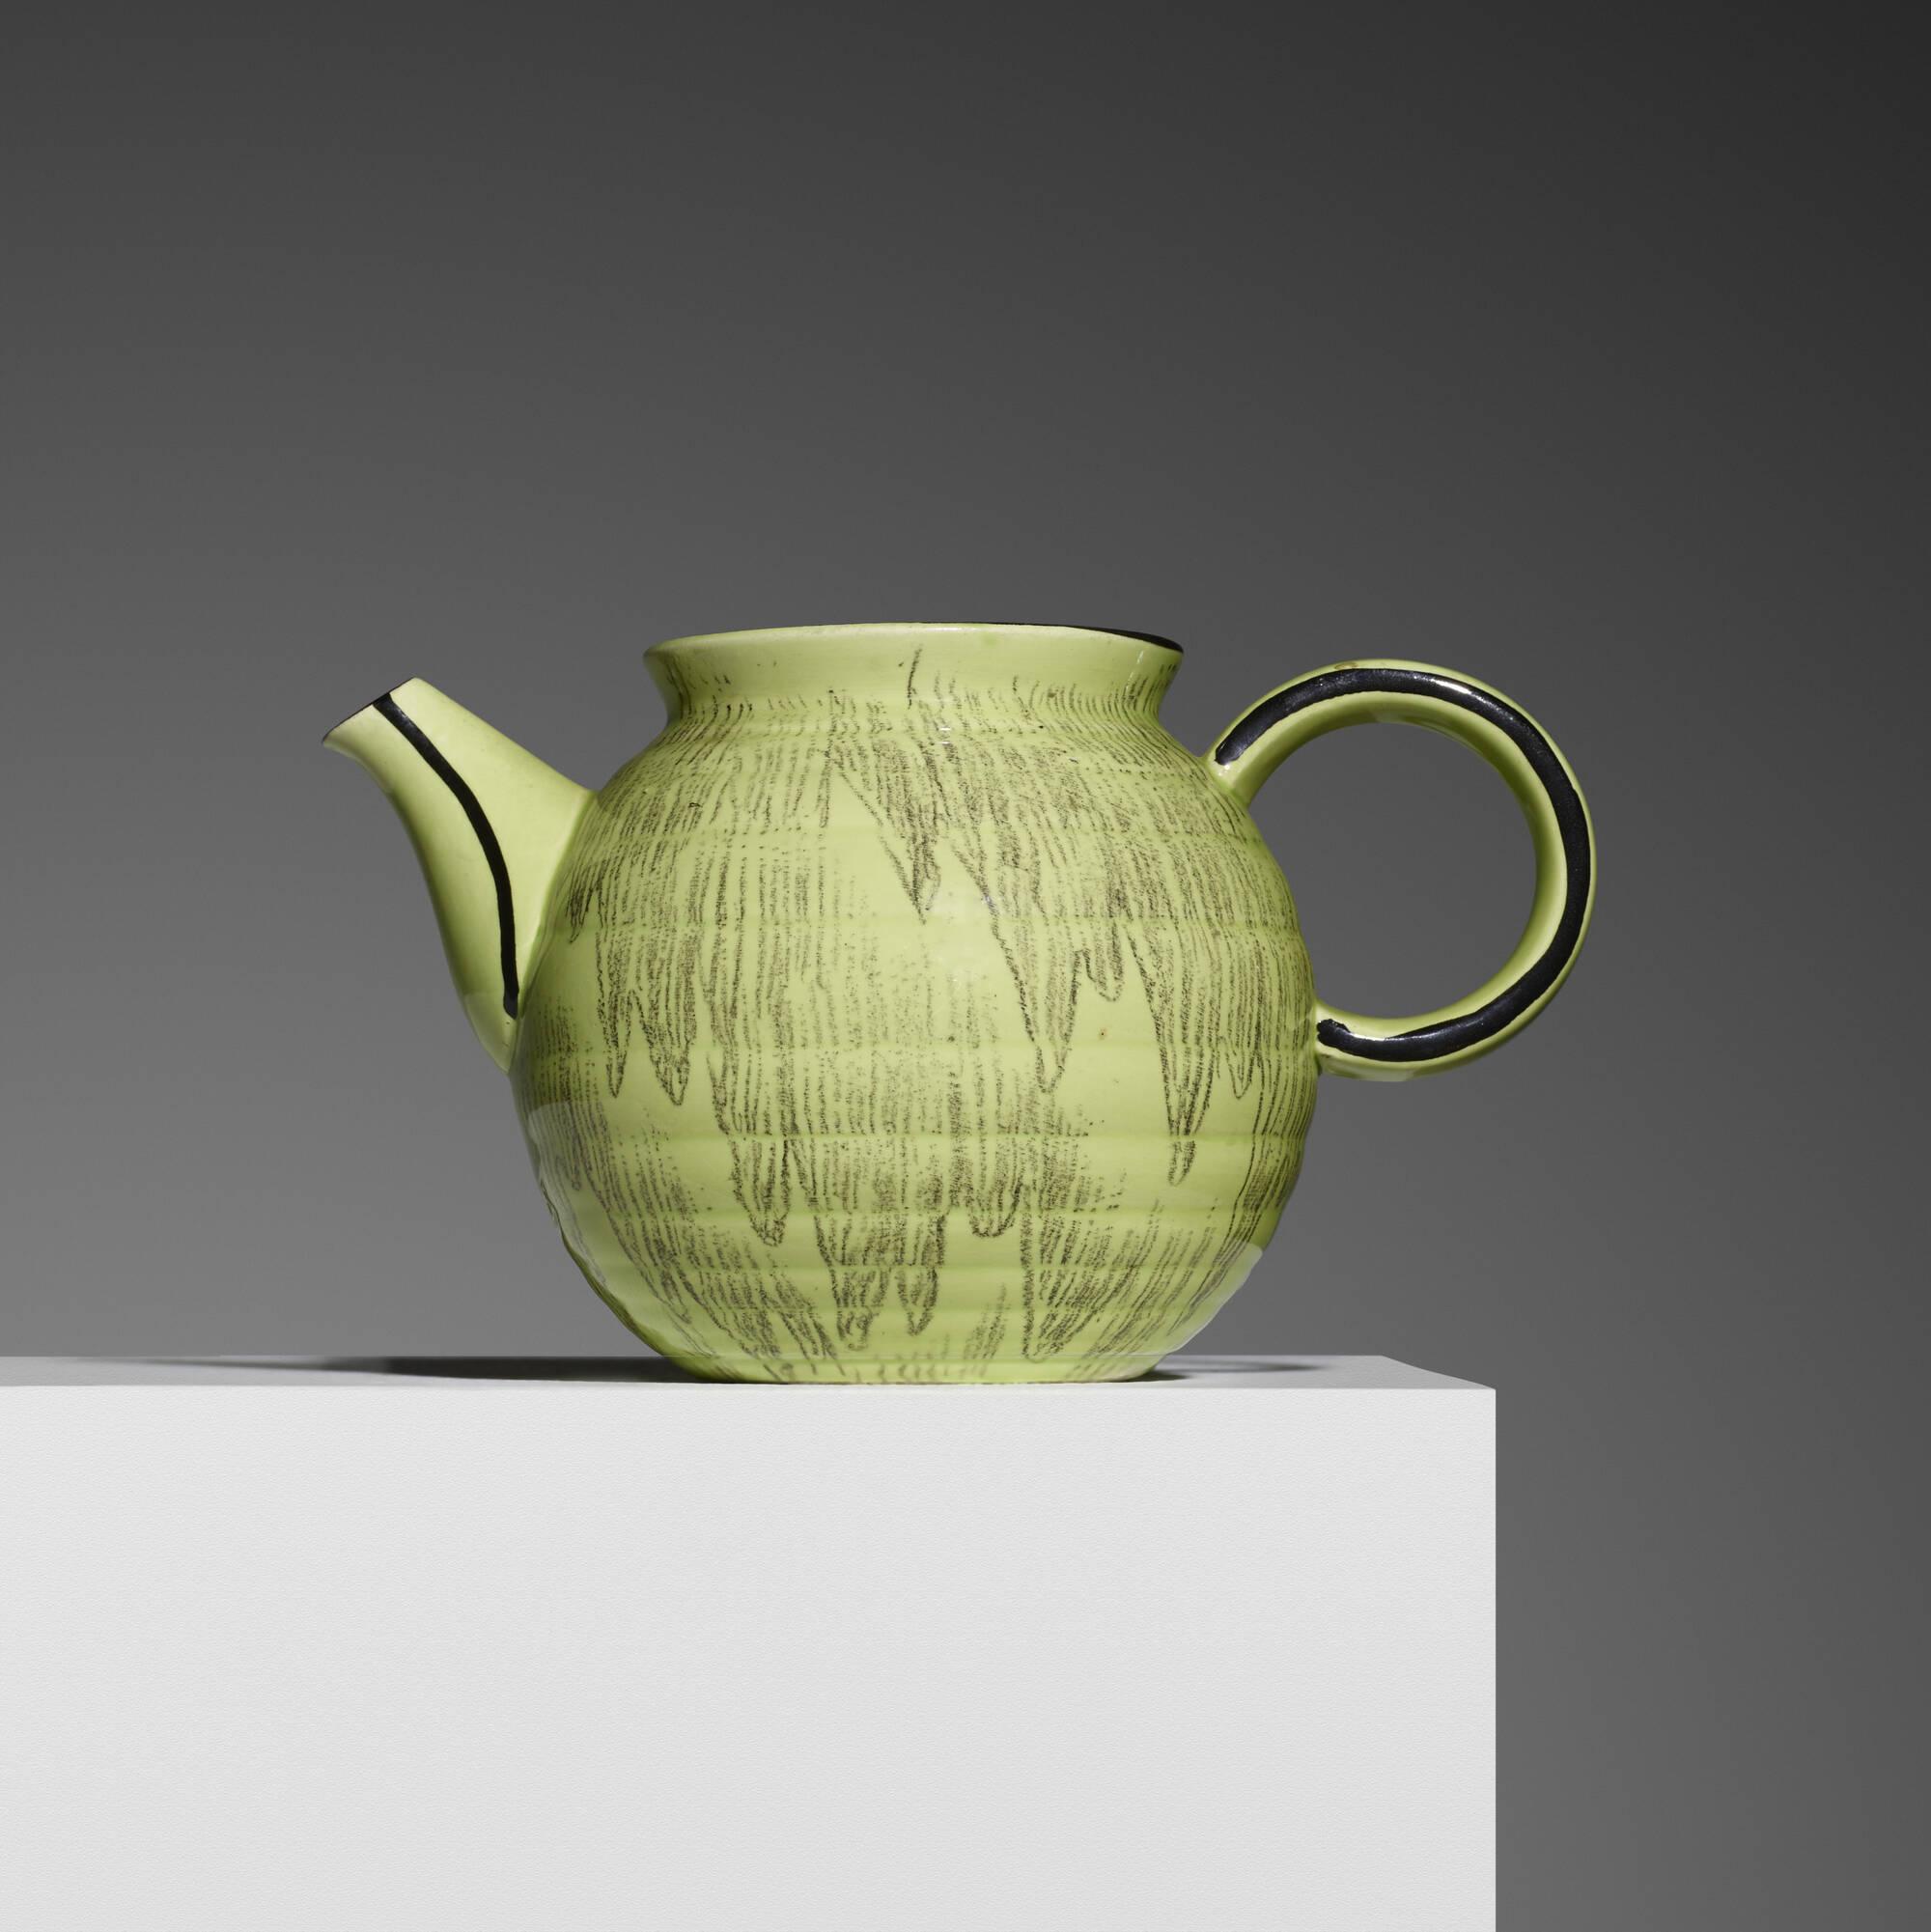 337: Eva Zeisel / teapot (1 of 2)